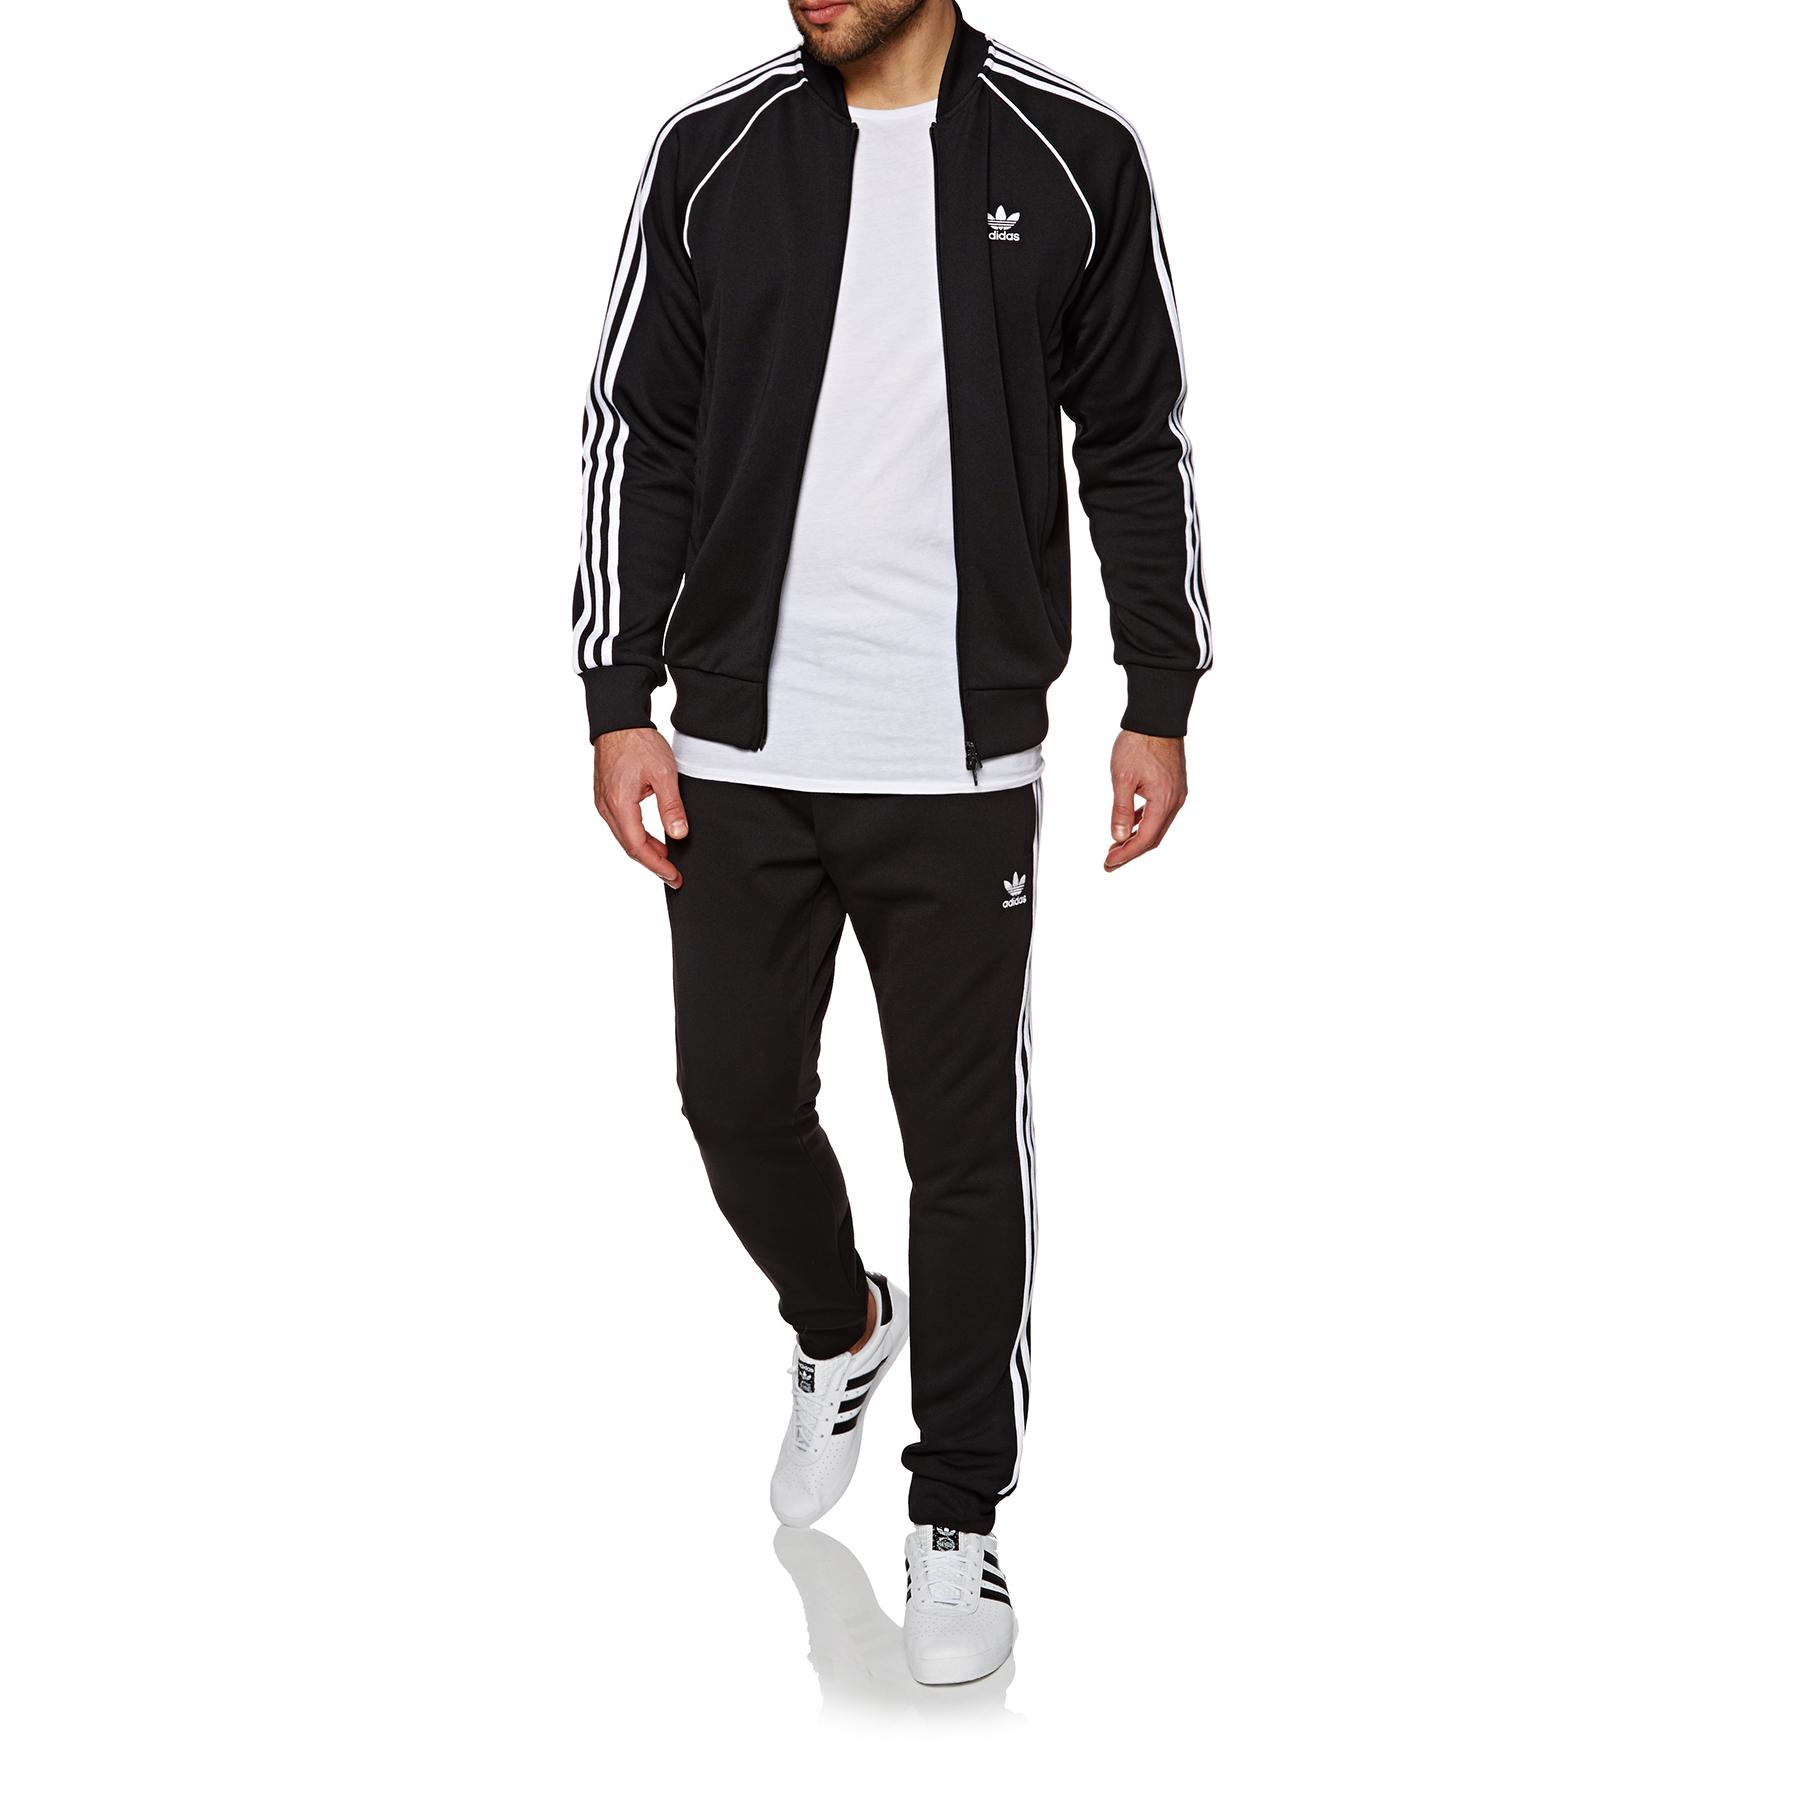 NEW MEN'S ADIDAS Originals Cw1256 Sst Track Jacket Black White